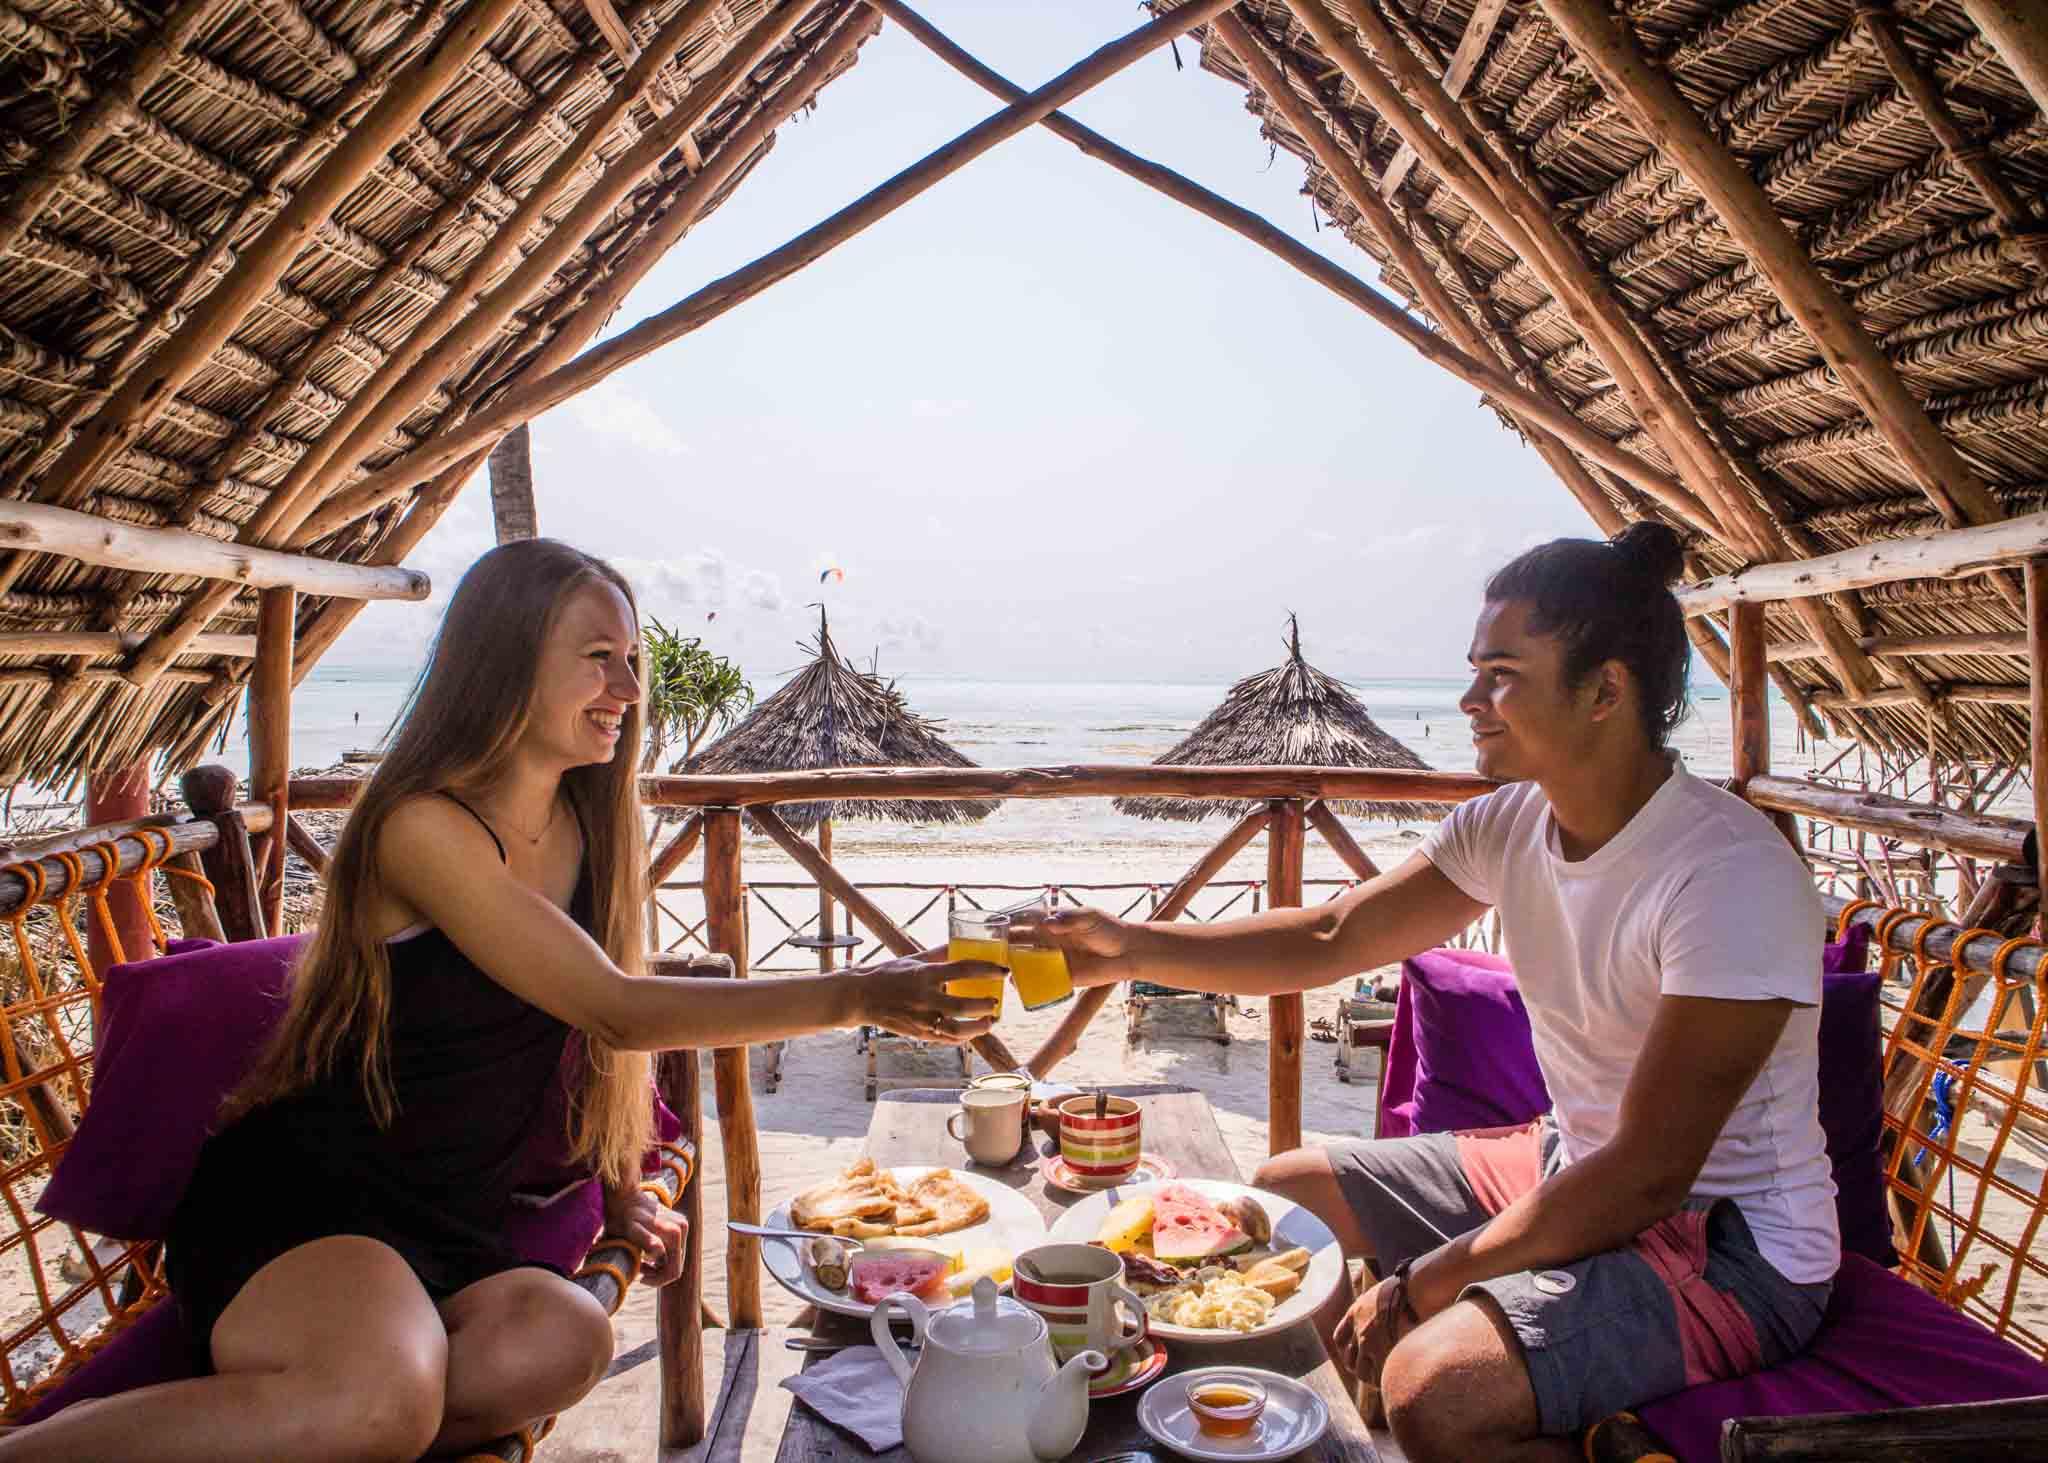 Blue reef sport & fishing lodge, Zanzibar